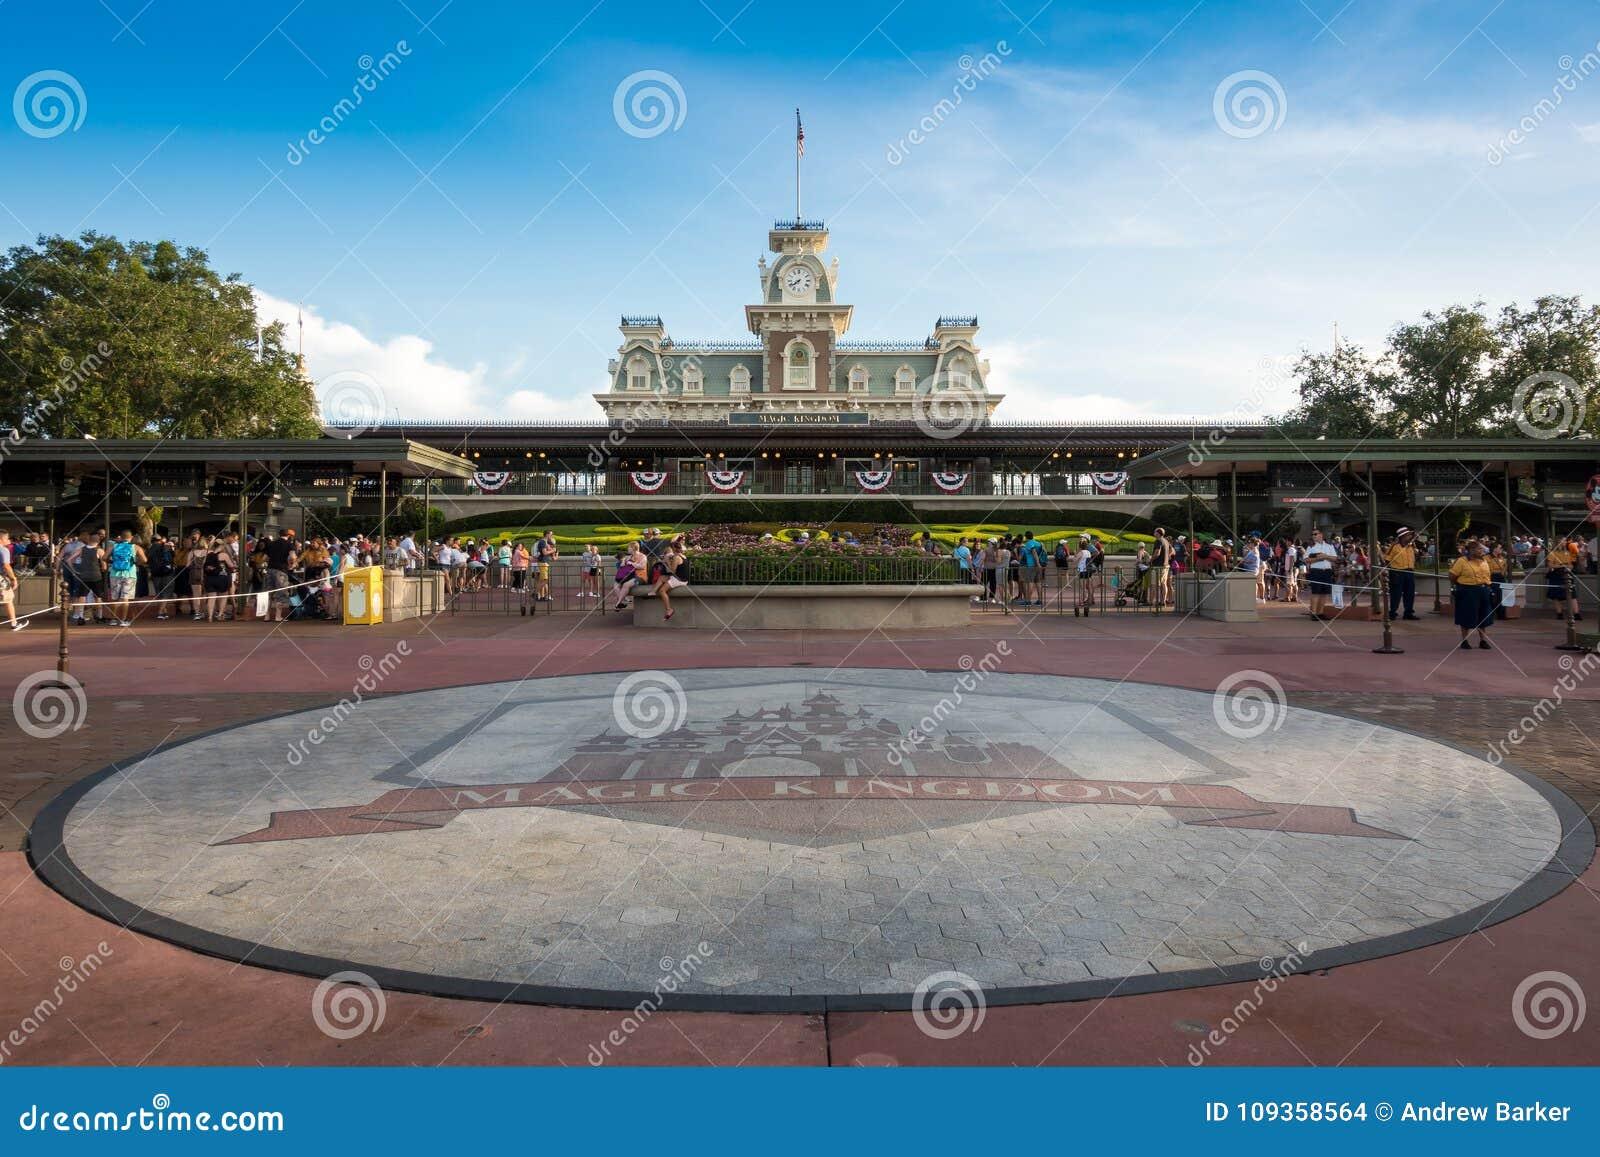 Magic Kingdom Theme Park